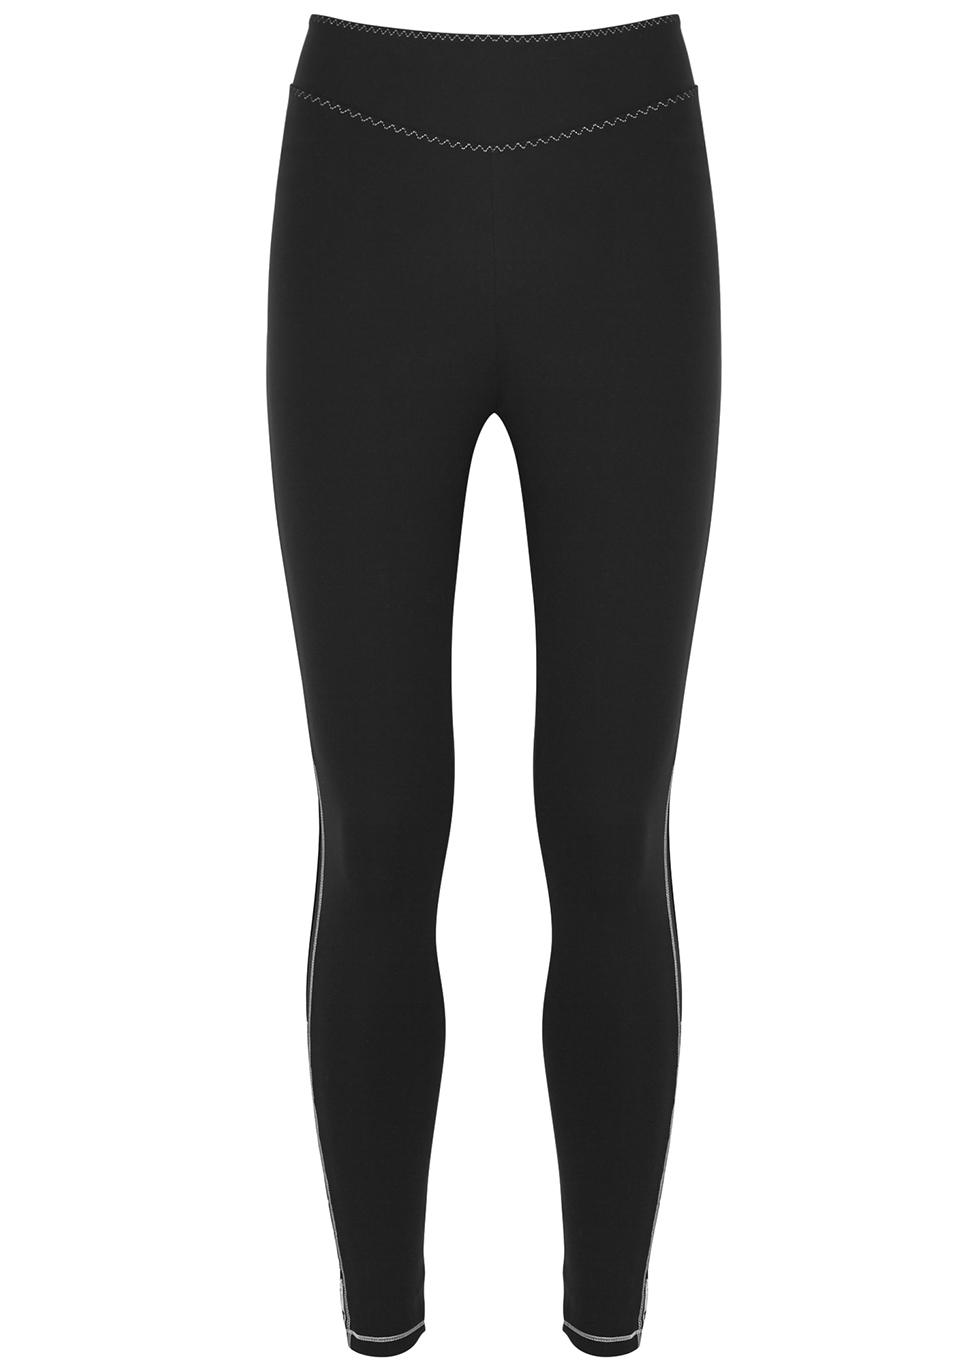 Corona black stretch-jersey leggings - Sàpopa